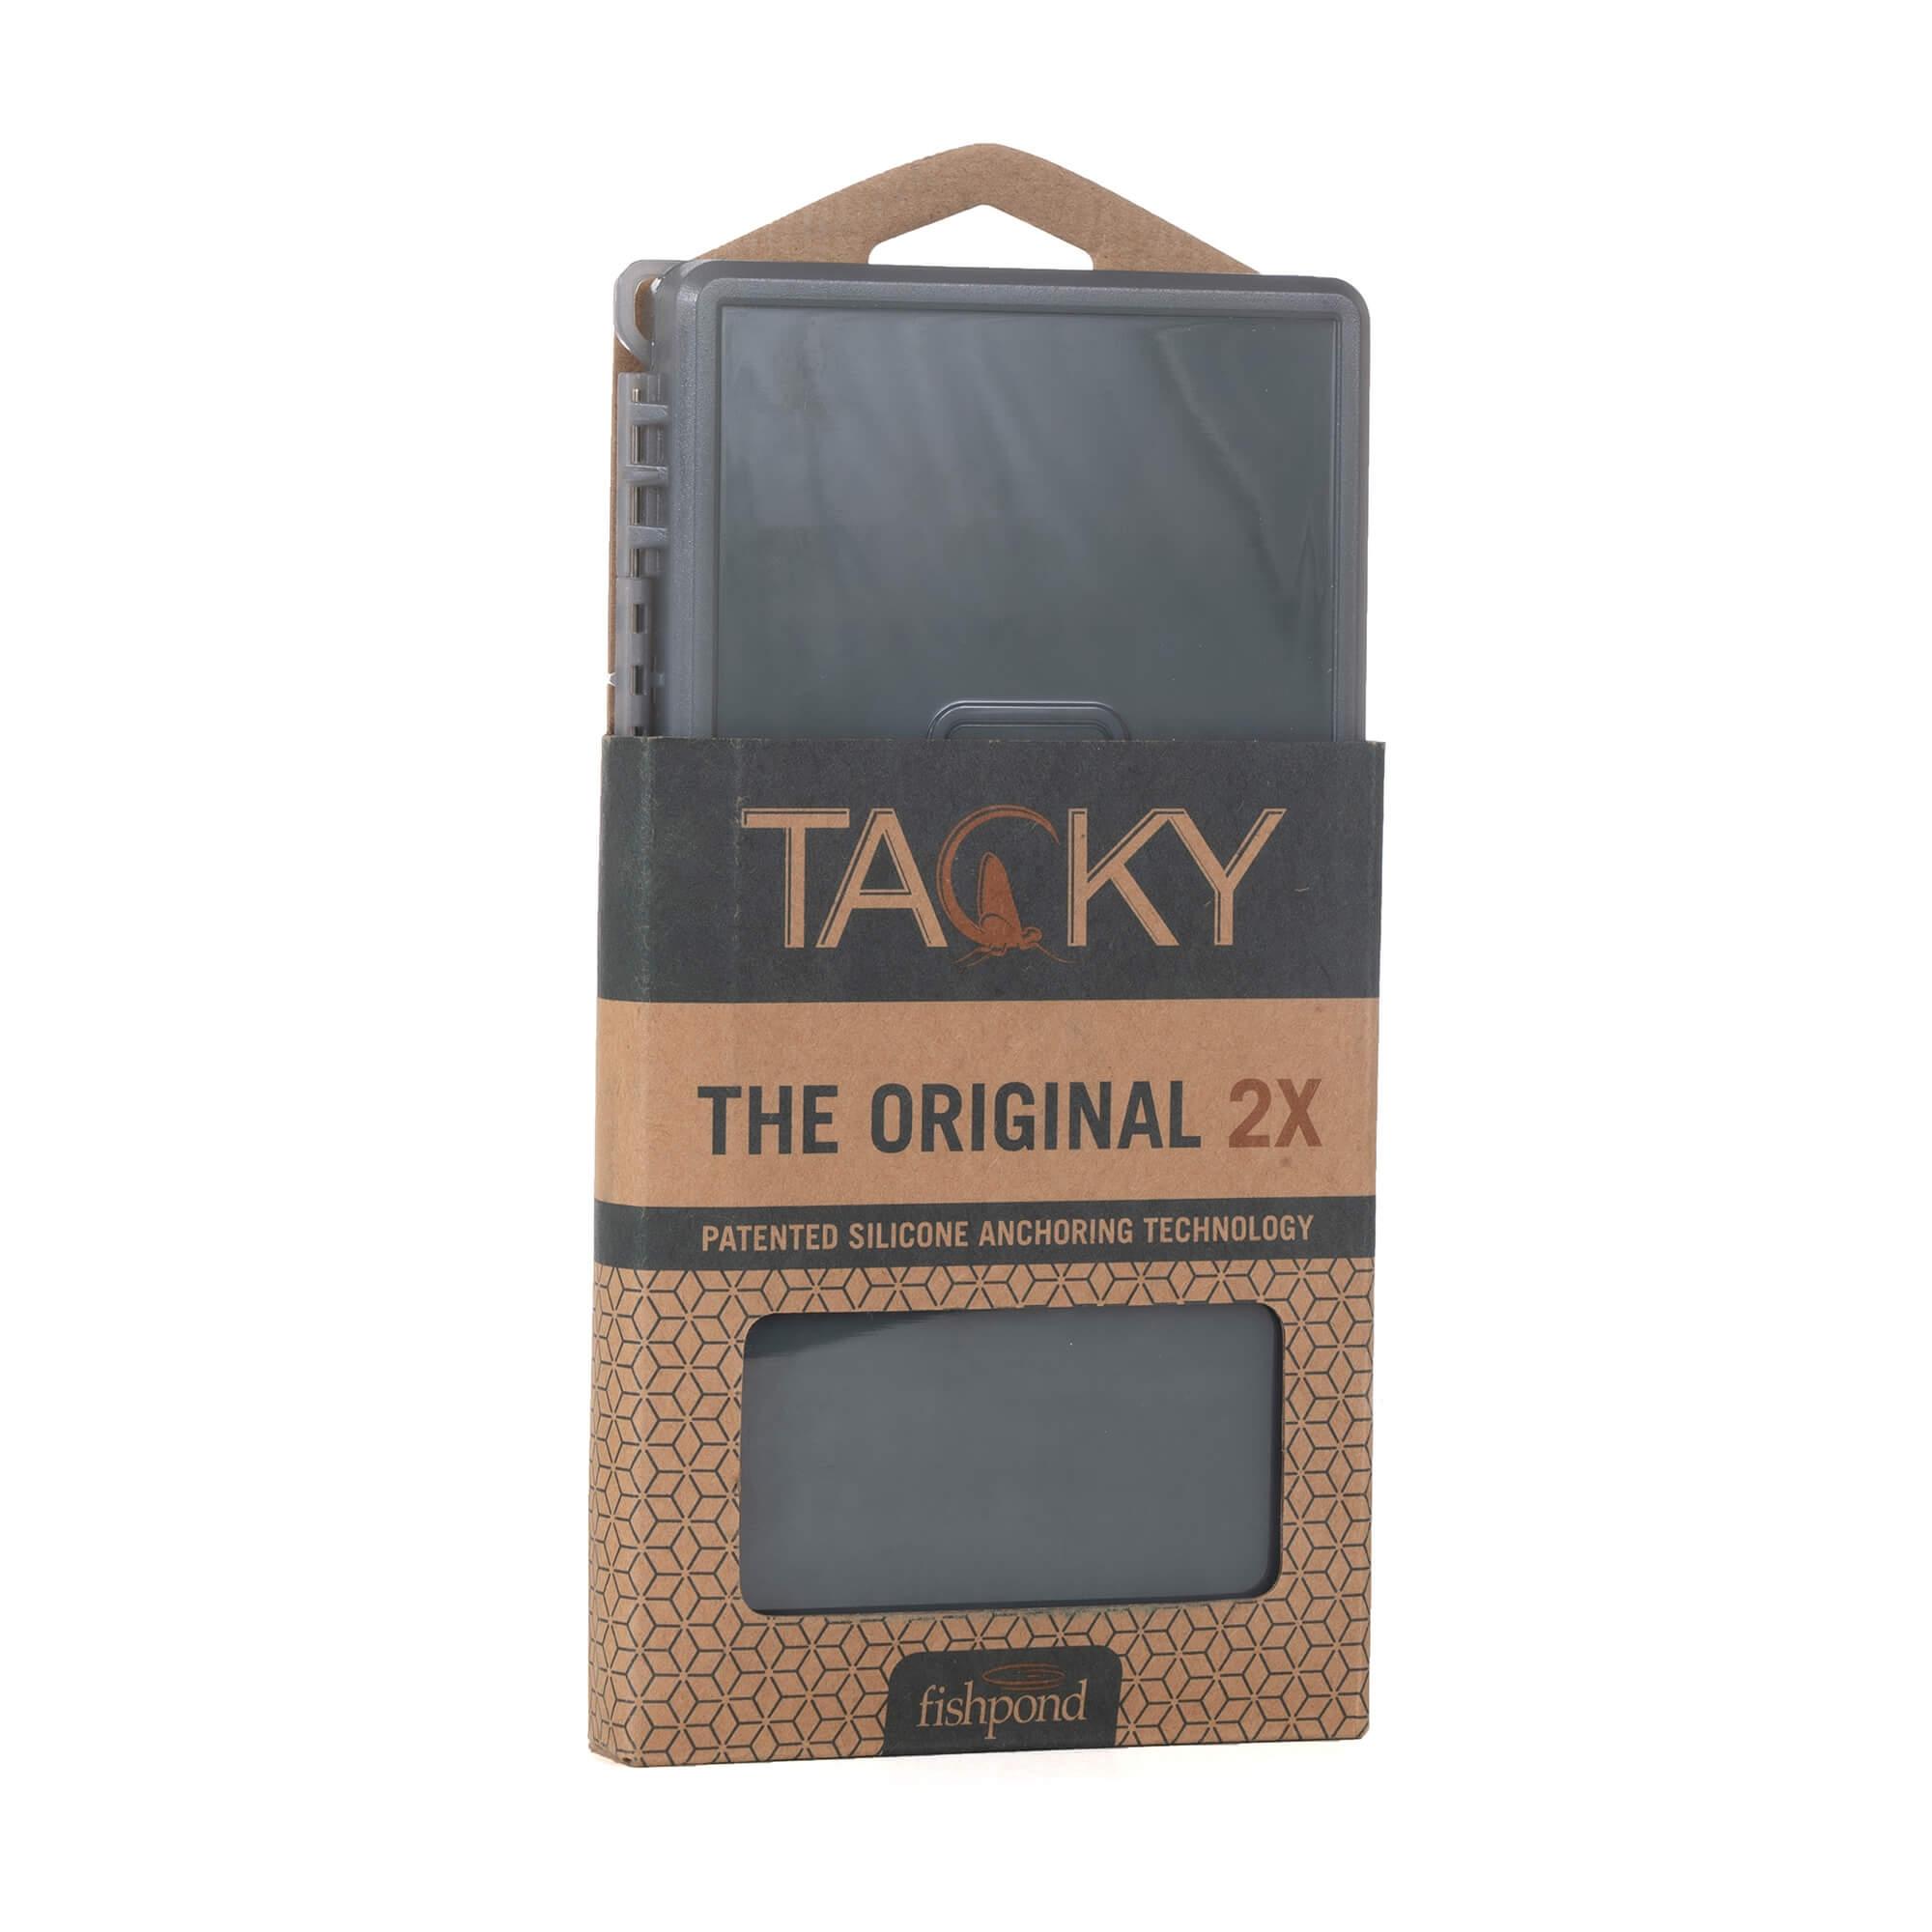 TACKY ORIGINAL FLY BOX DOUBLE SIDED